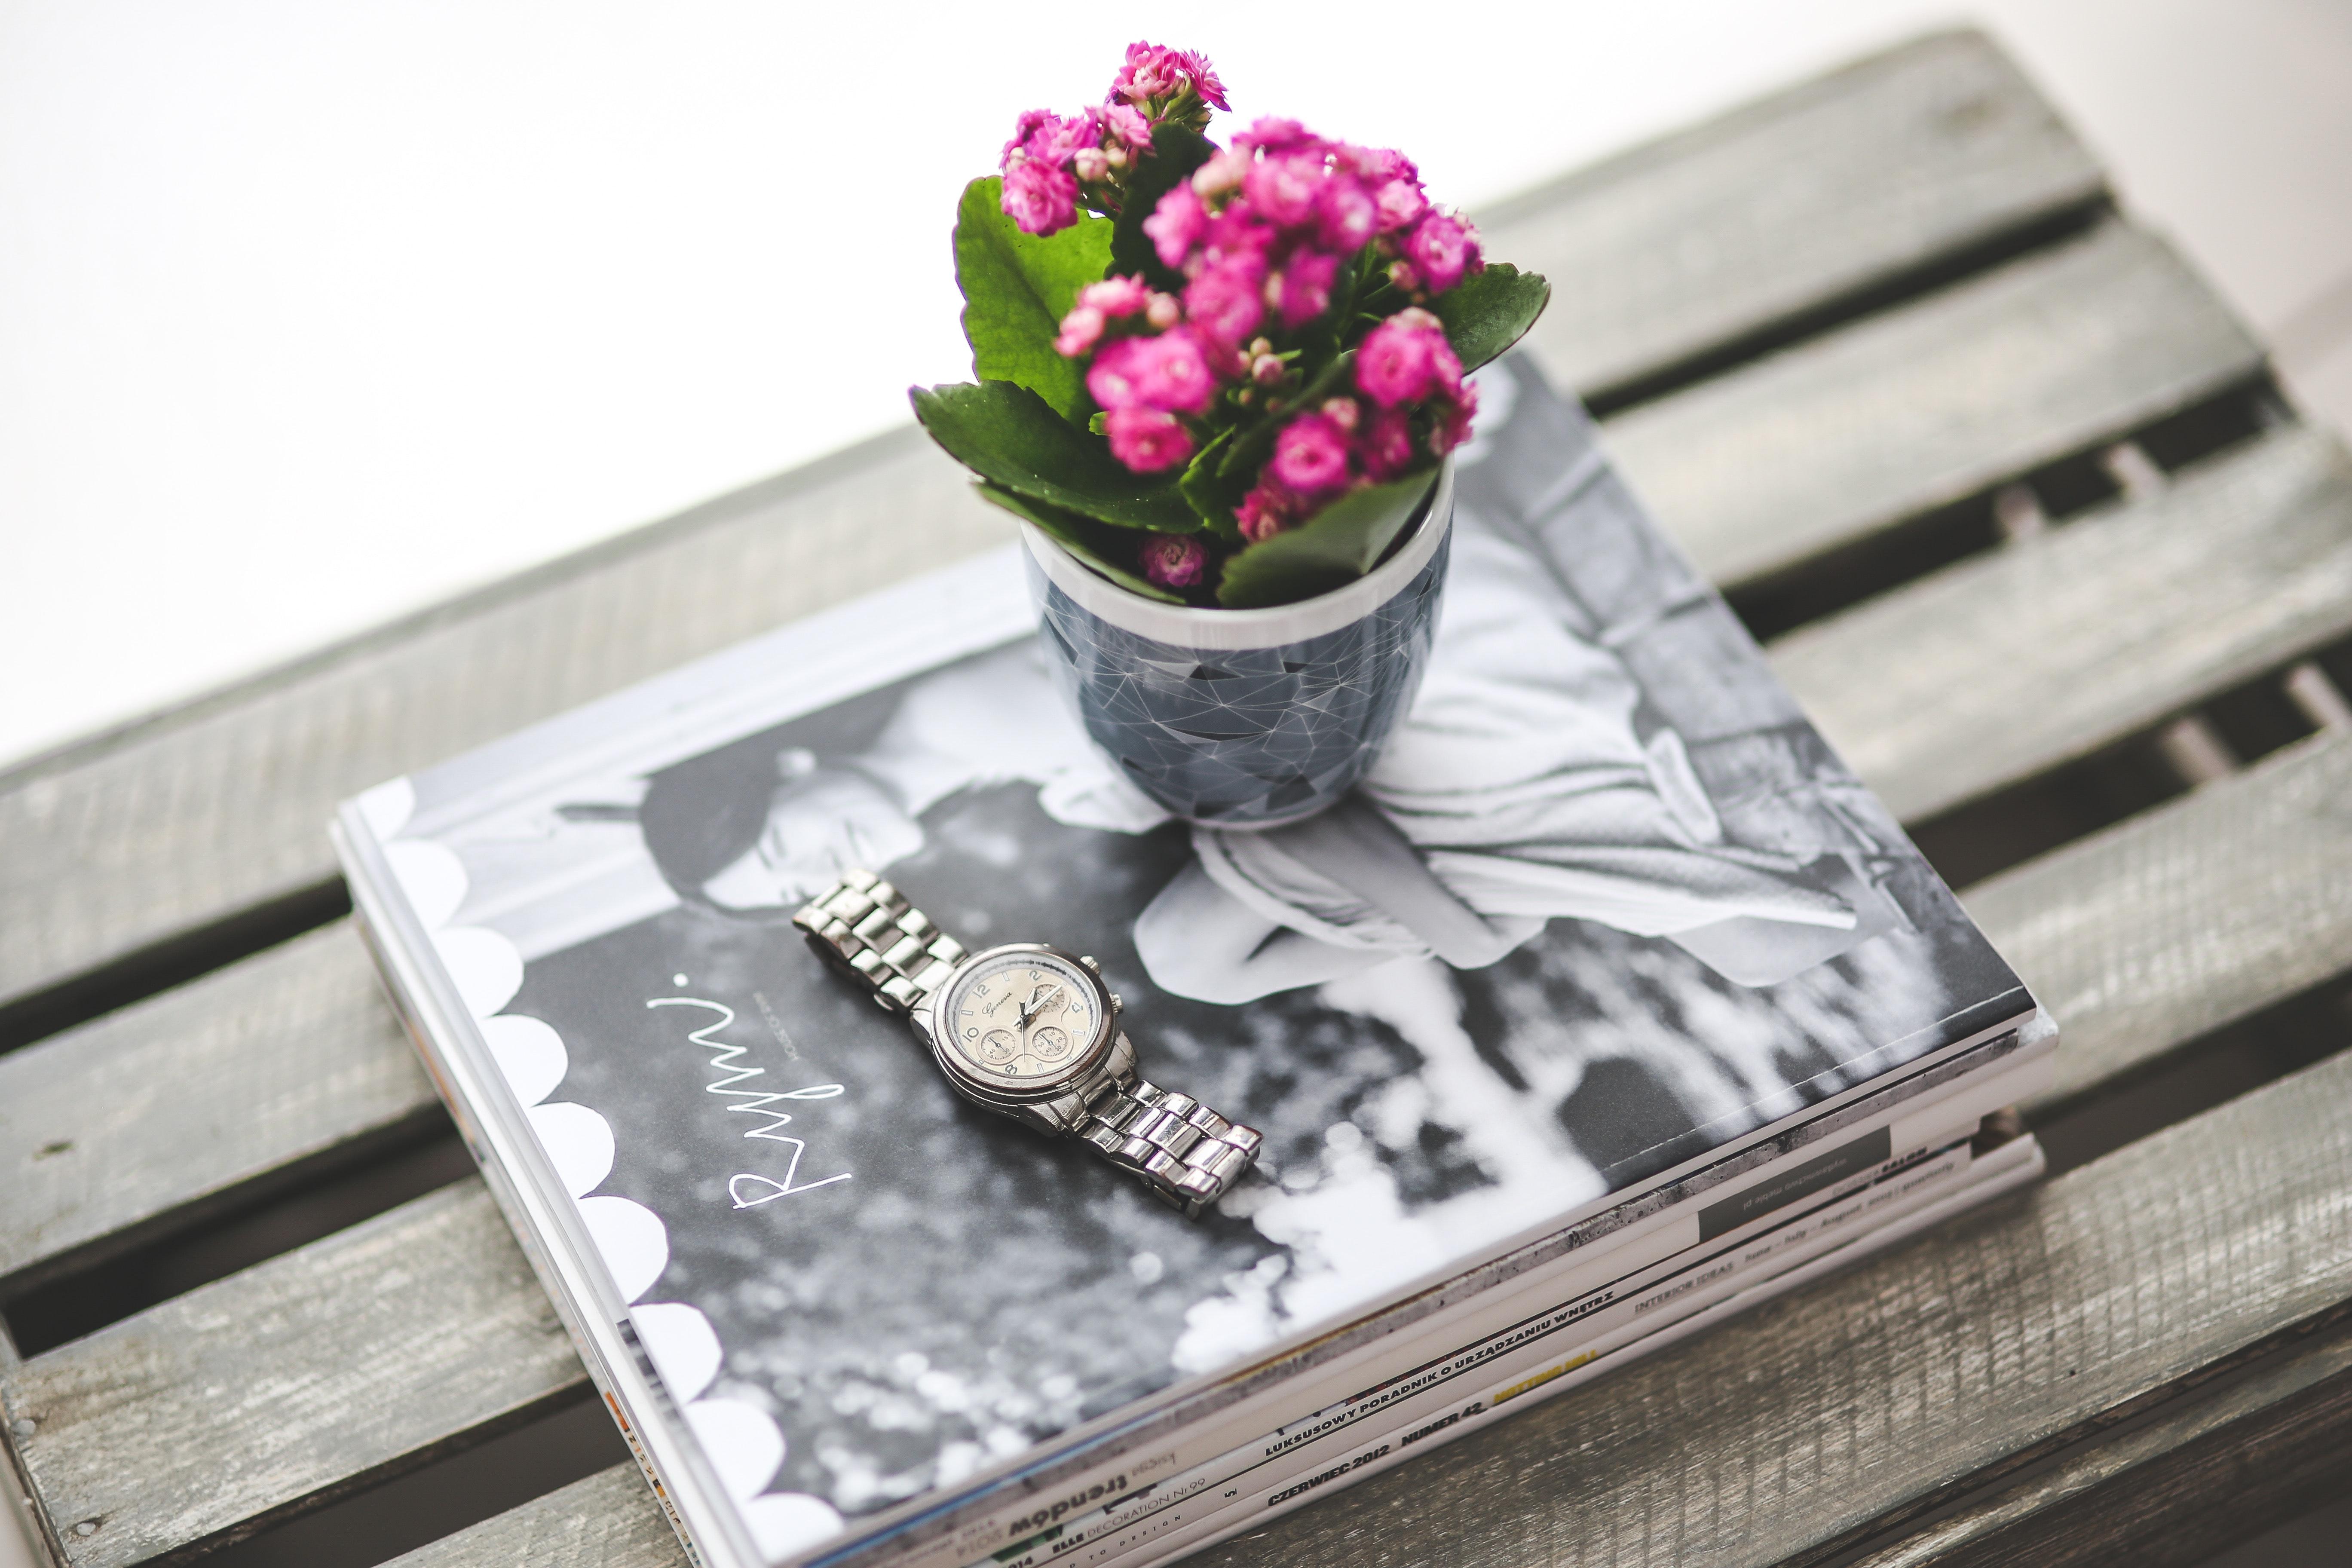 Silver watch, Business, Pink, Wedding, Watch, HQ Photo